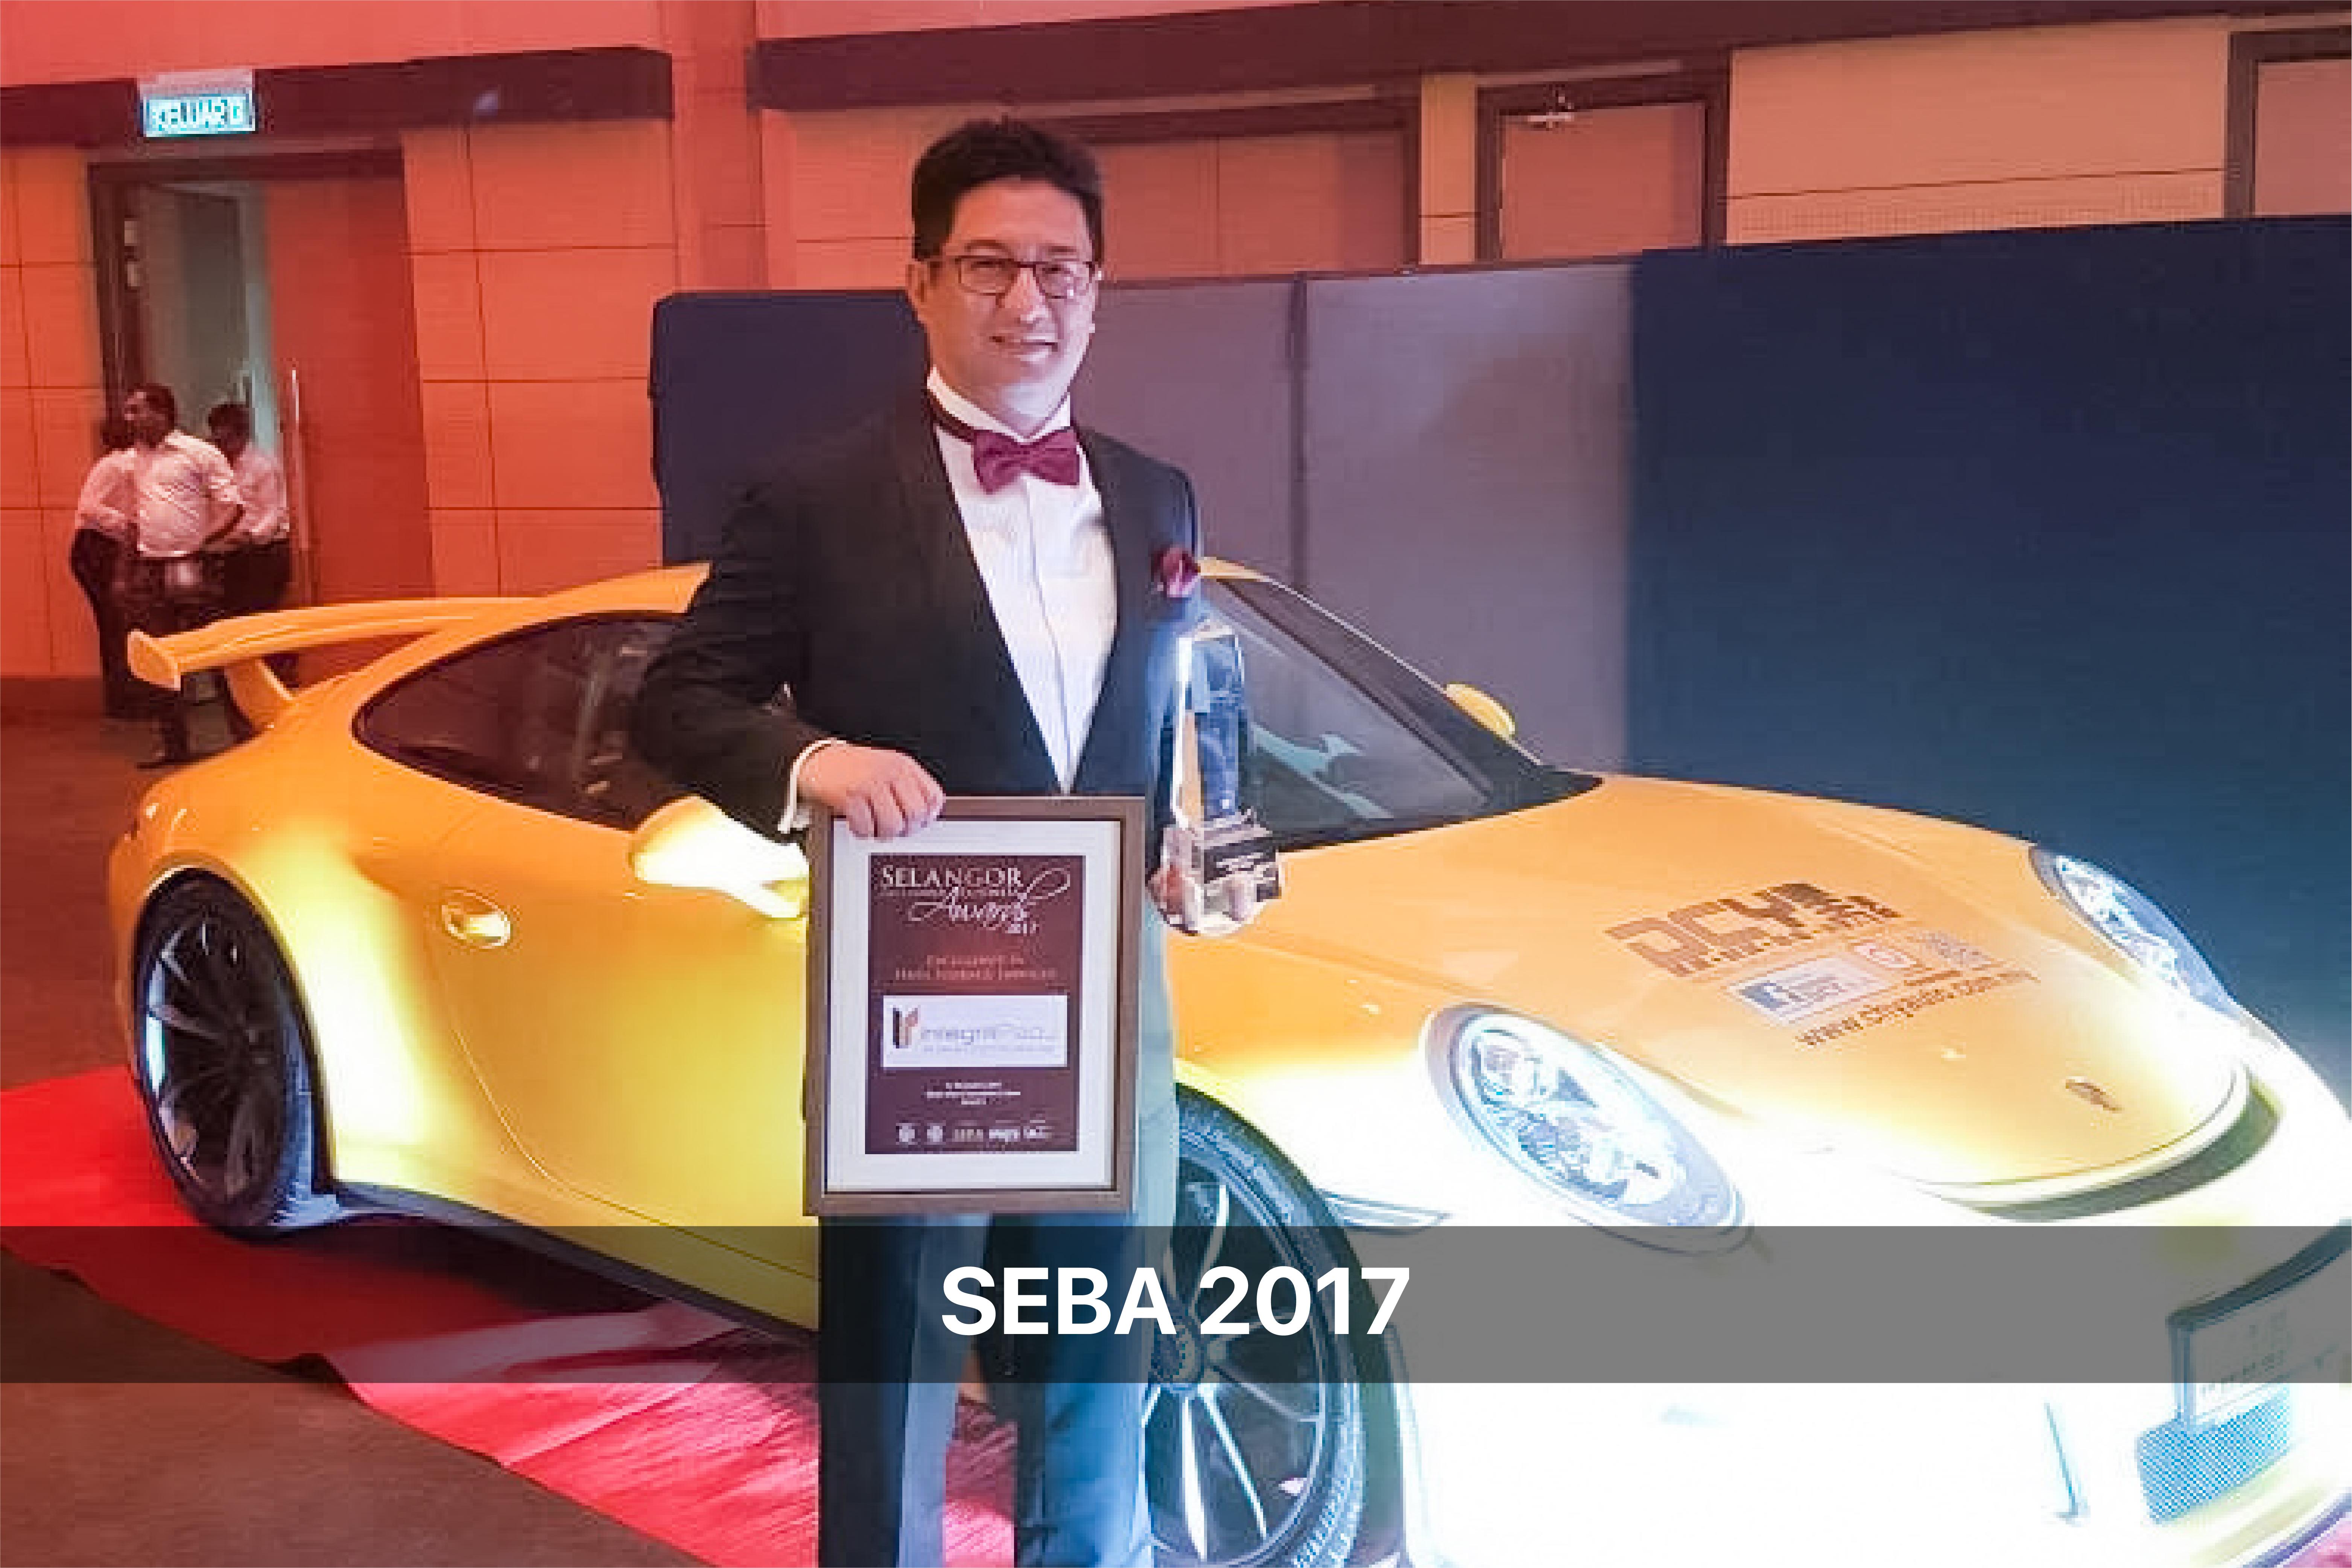 IPSB Technology SEBA2017